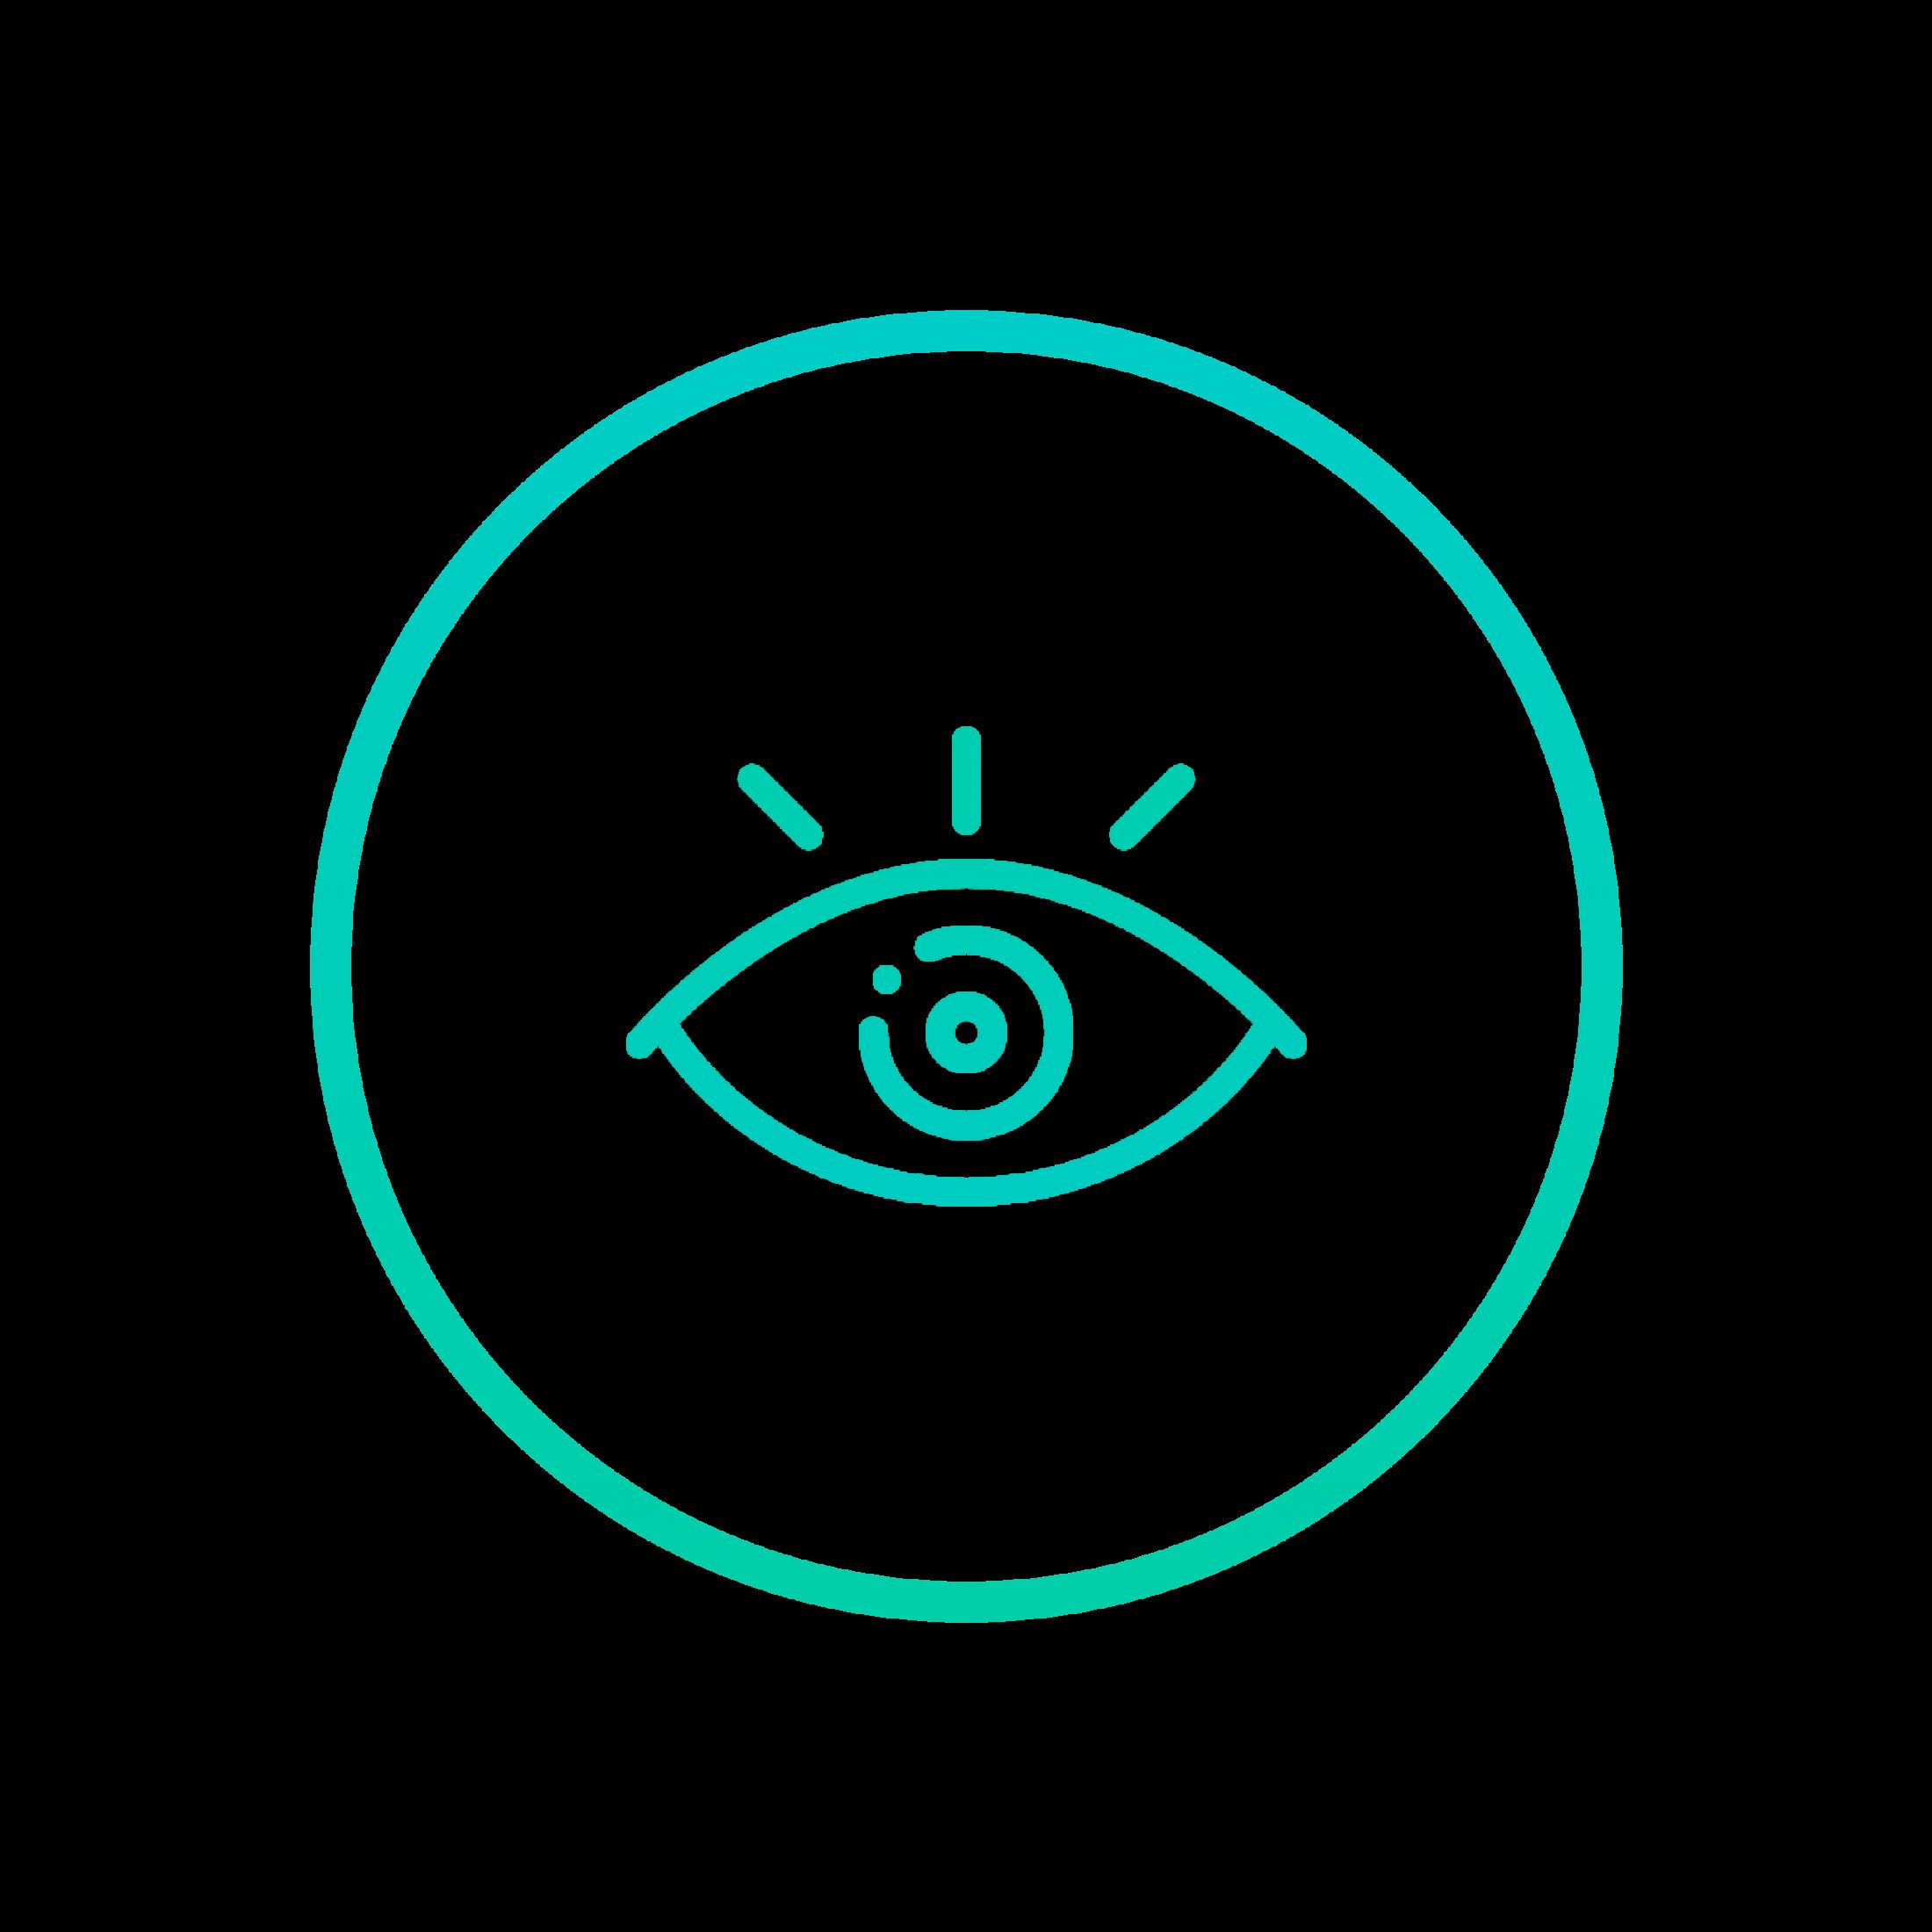 Vission Icon